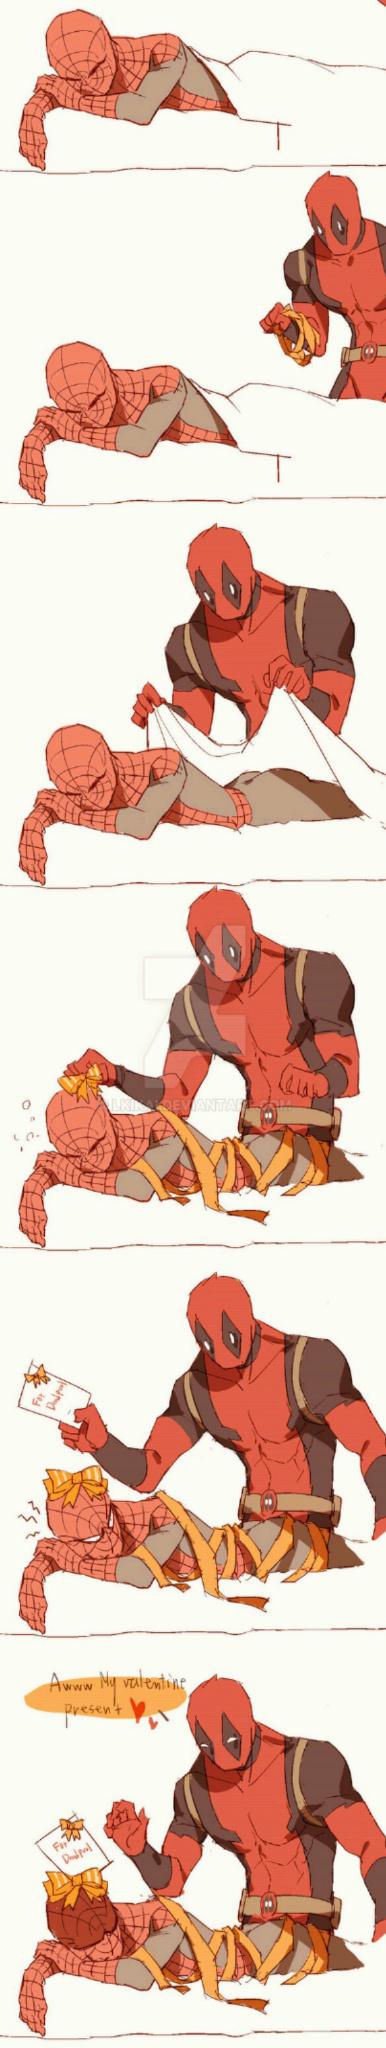 Deadpool ( ͡° ͜ʖ ͡°) - meme